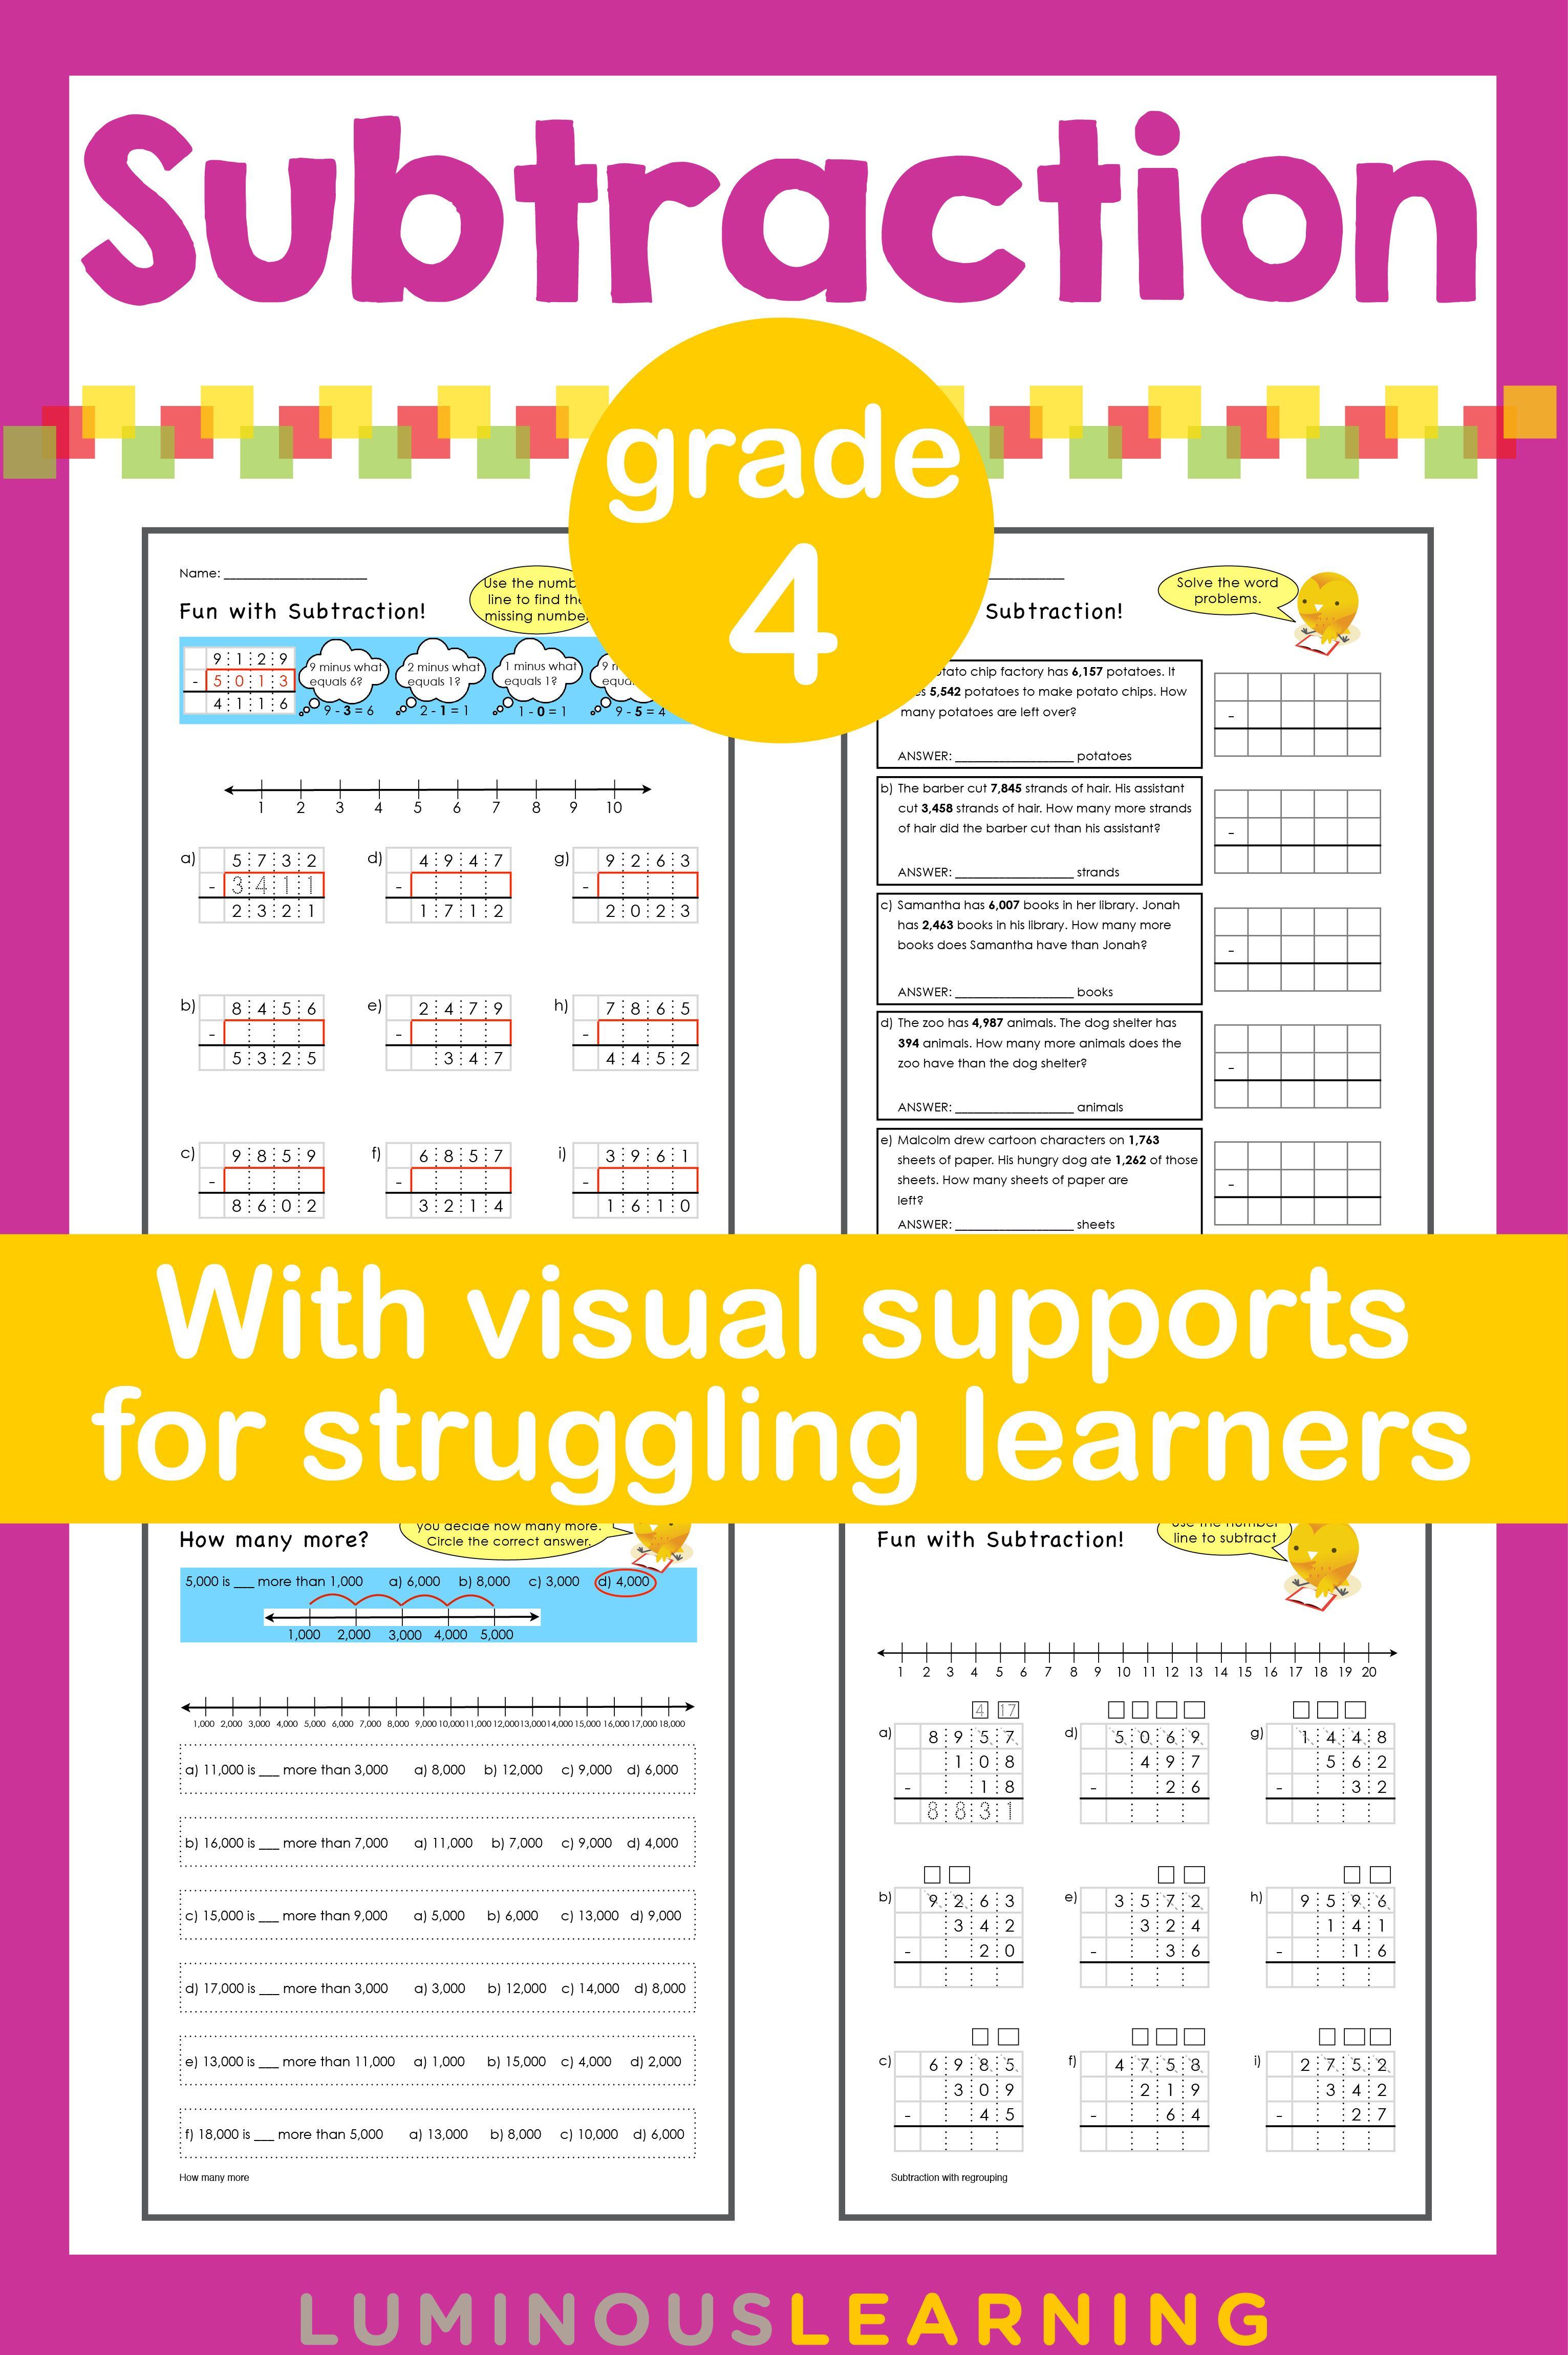 Luminous Learning Grade 4 Subtraction Workbook Is Designed